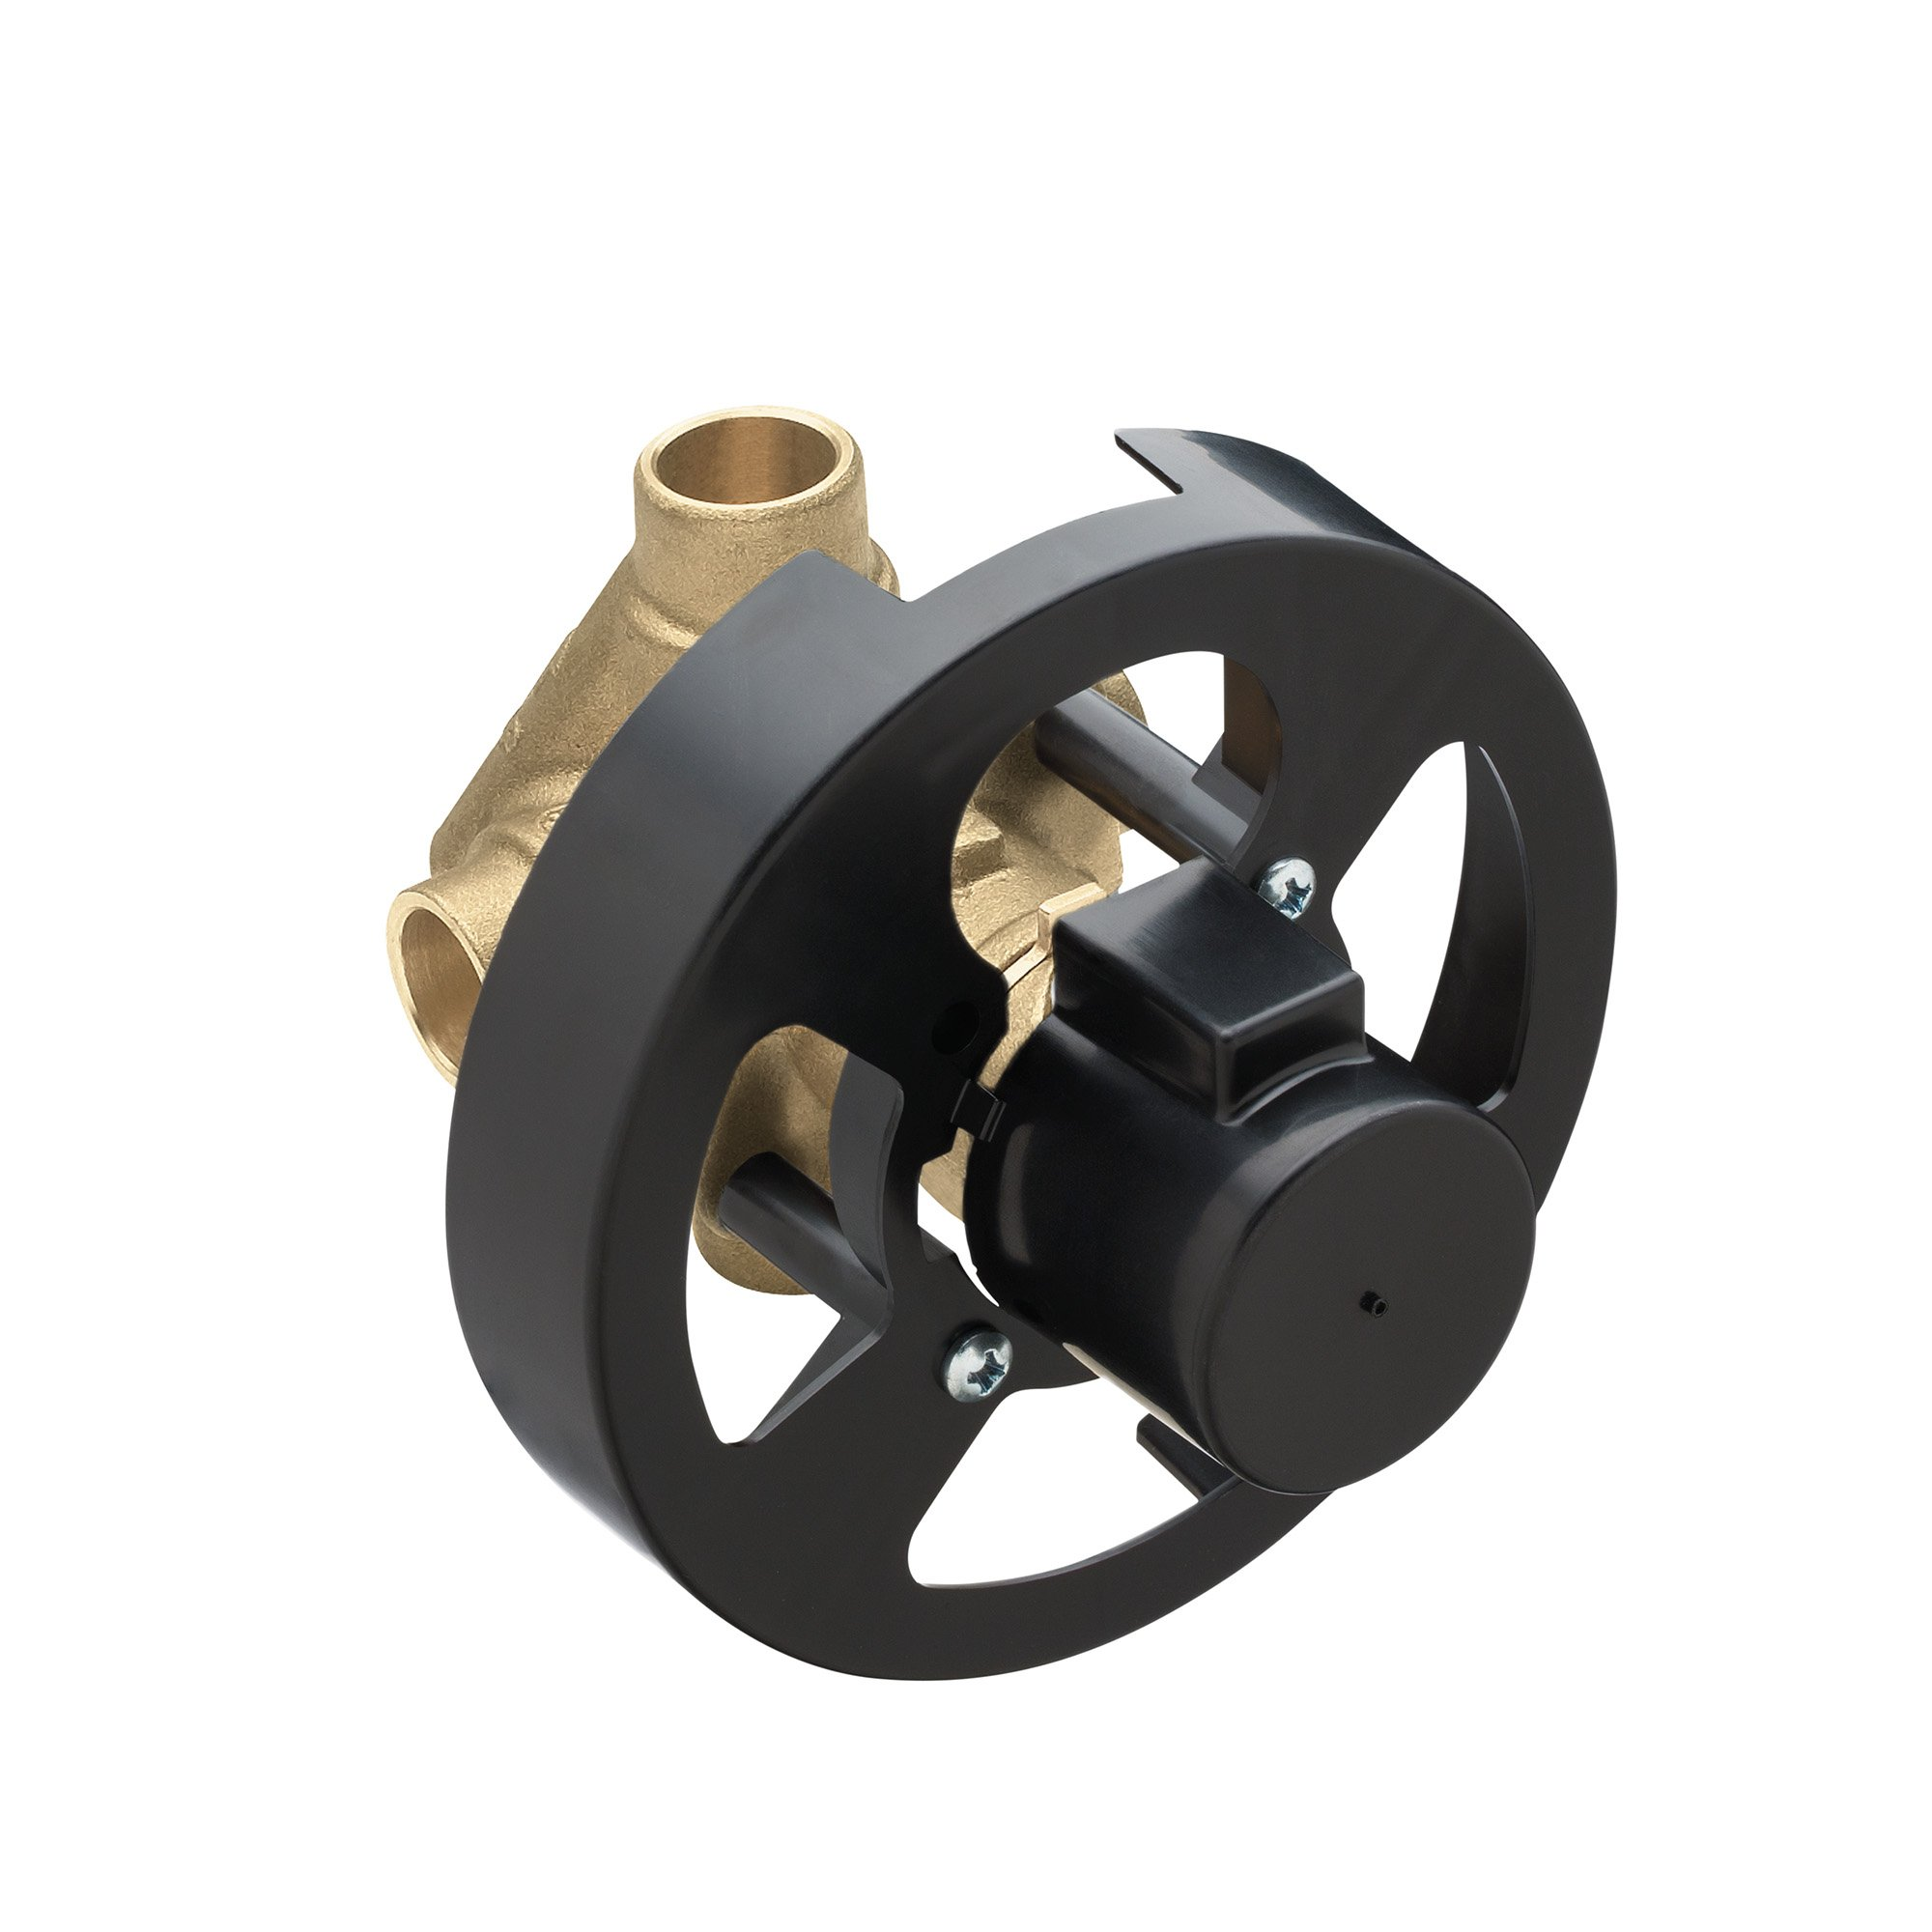 Moen 2520 Monticello PosiTemp Pressure Balancing Shower Valve, 1/2-Inch CC